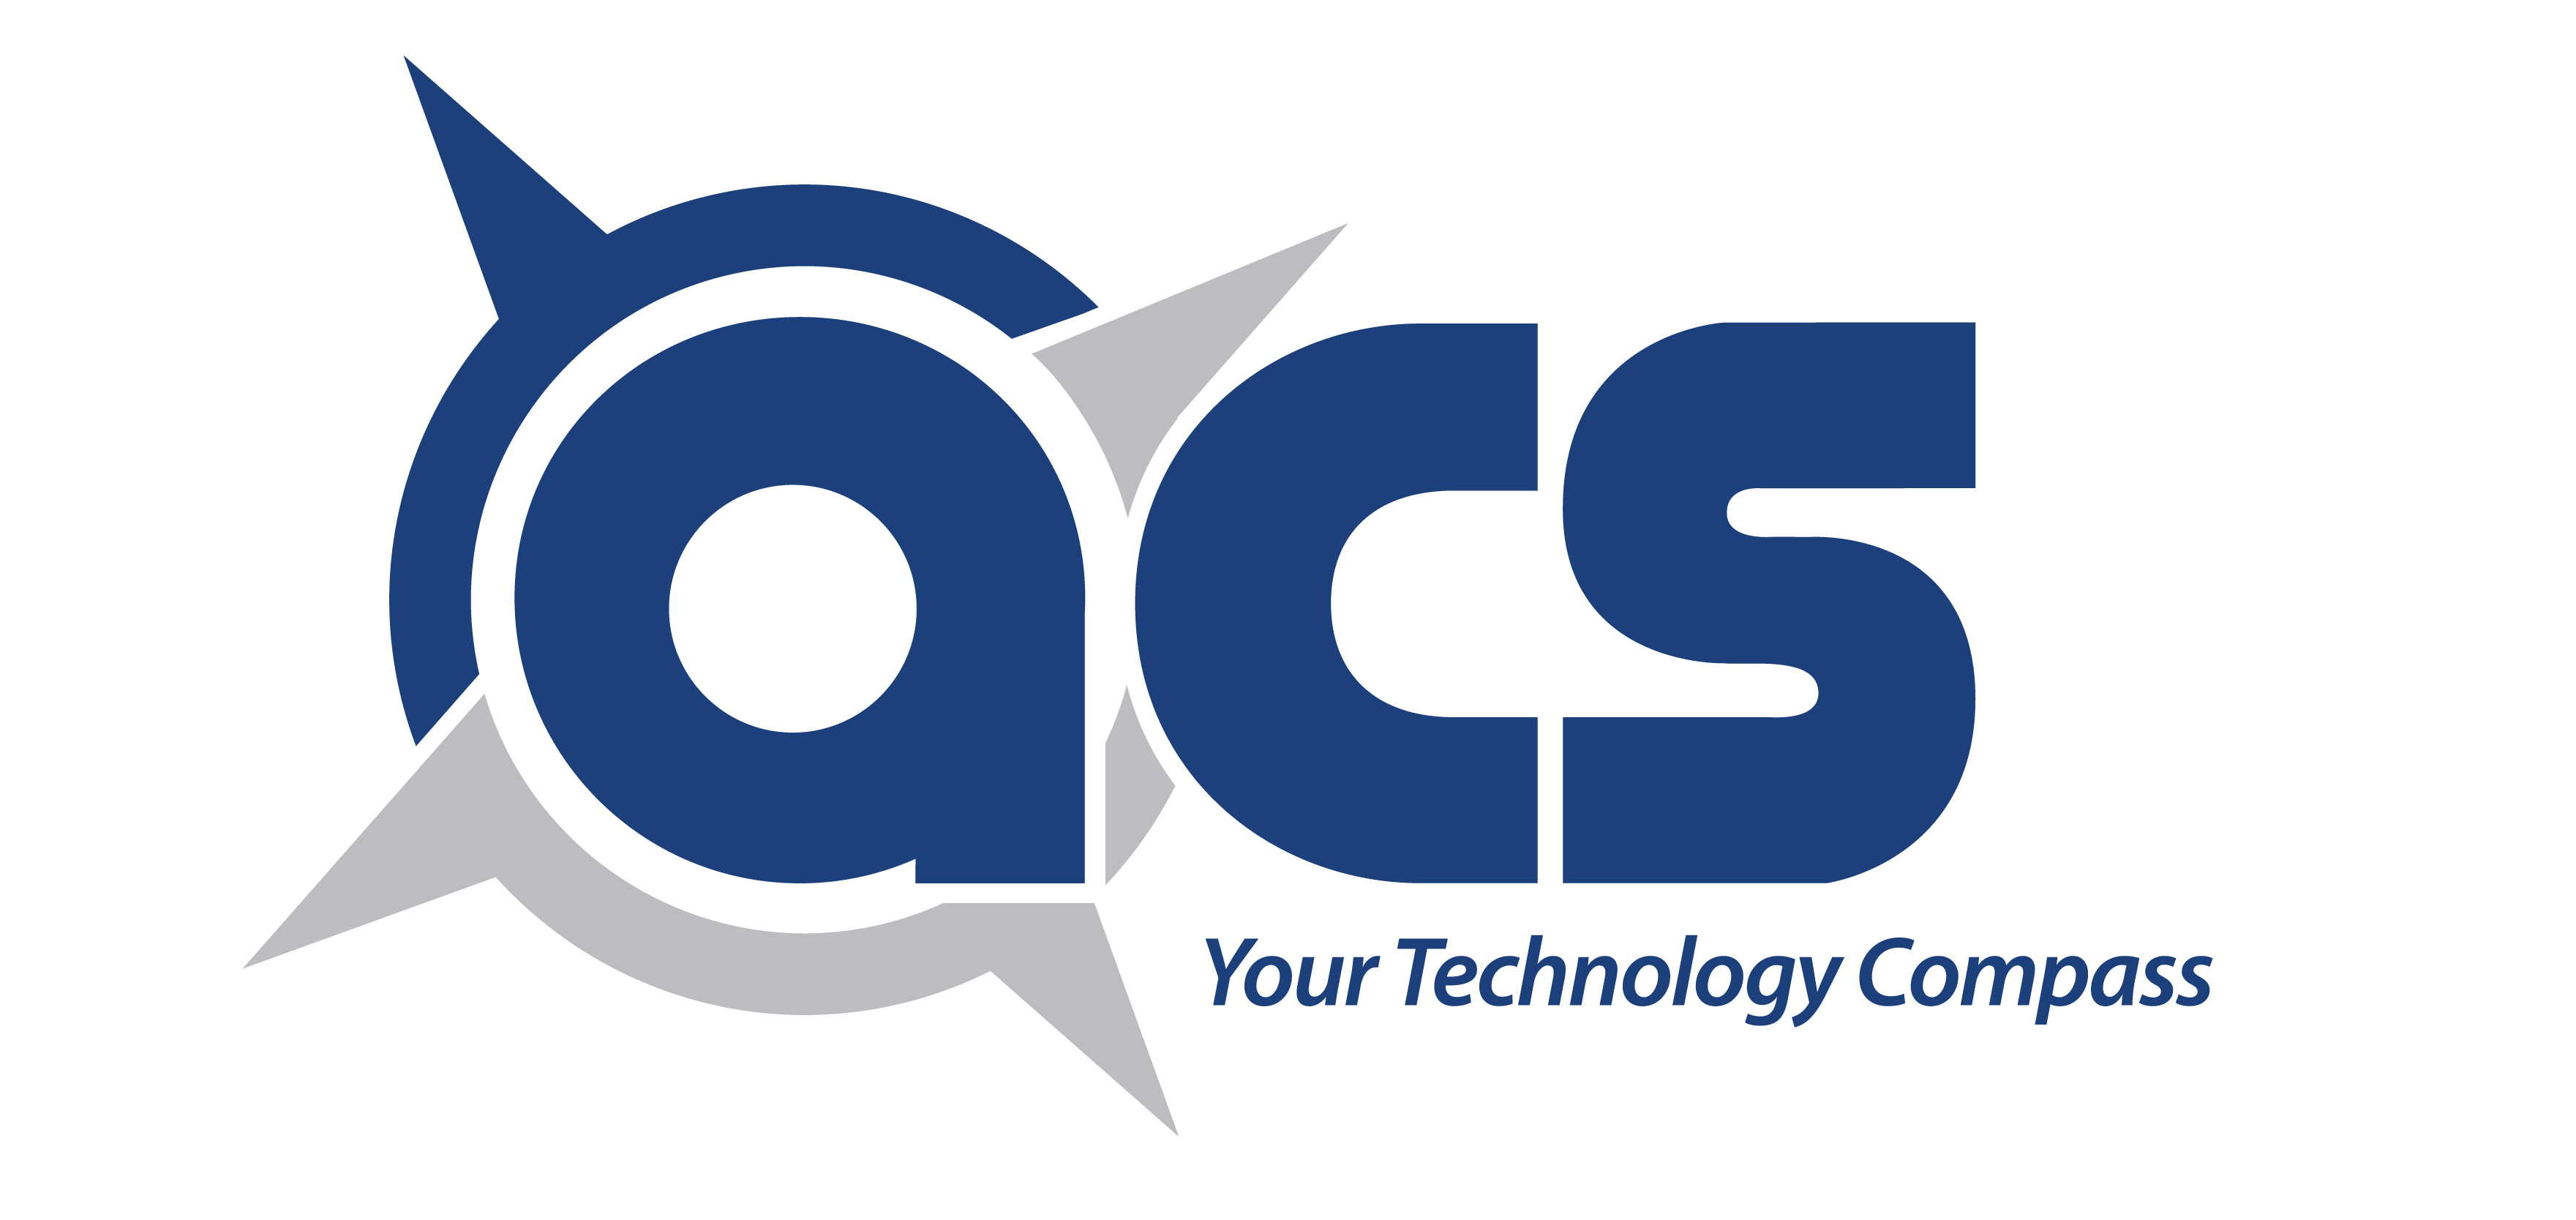 acs_logos_2015_HR_blue_grey